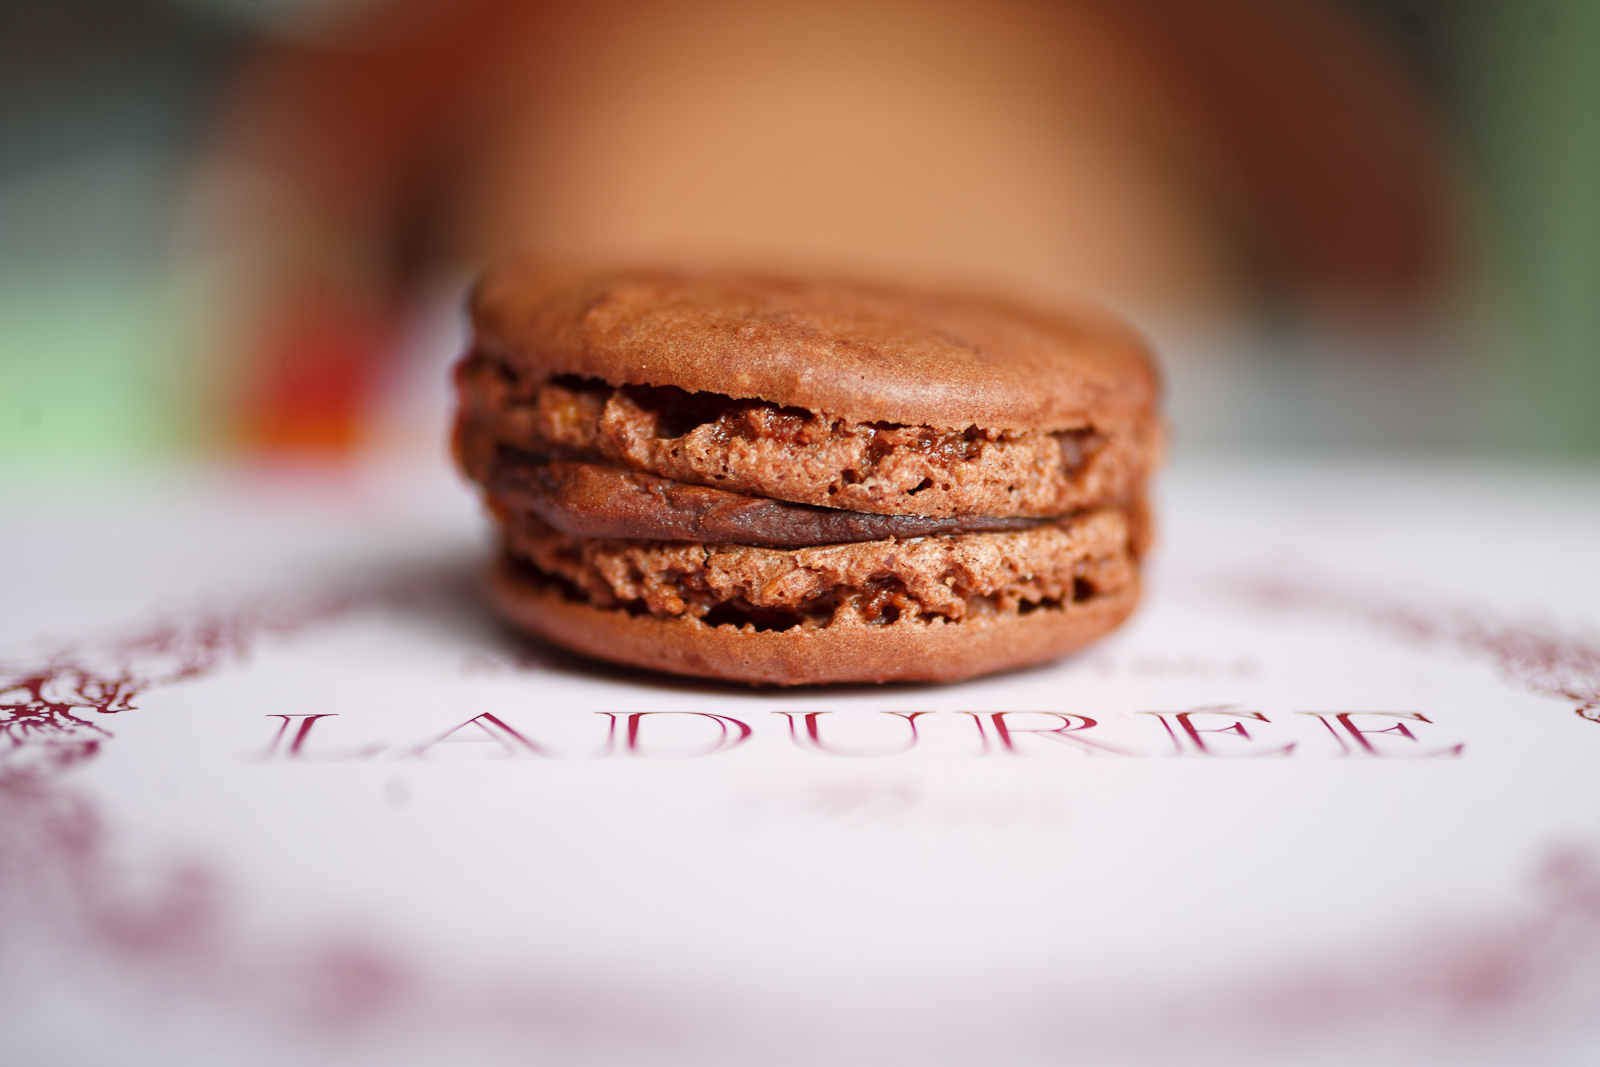 Macaron au chocolat amer (bittersweet chocolate)